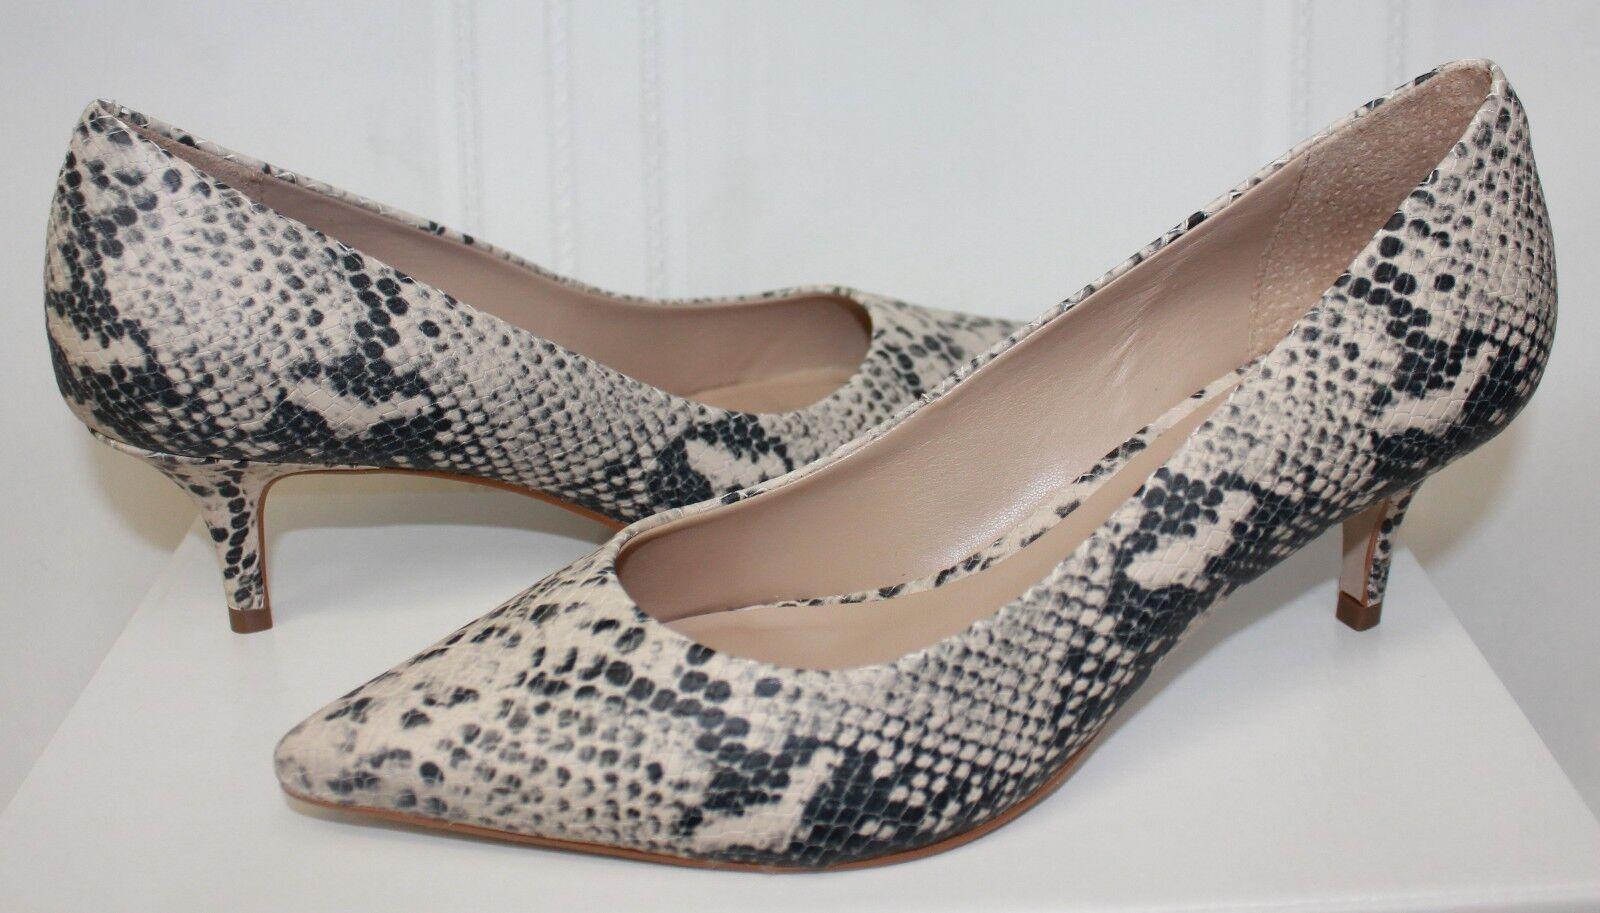 Steve Madden Sabrinah Kitten Heel Pump Snake Natural Leather New With Box